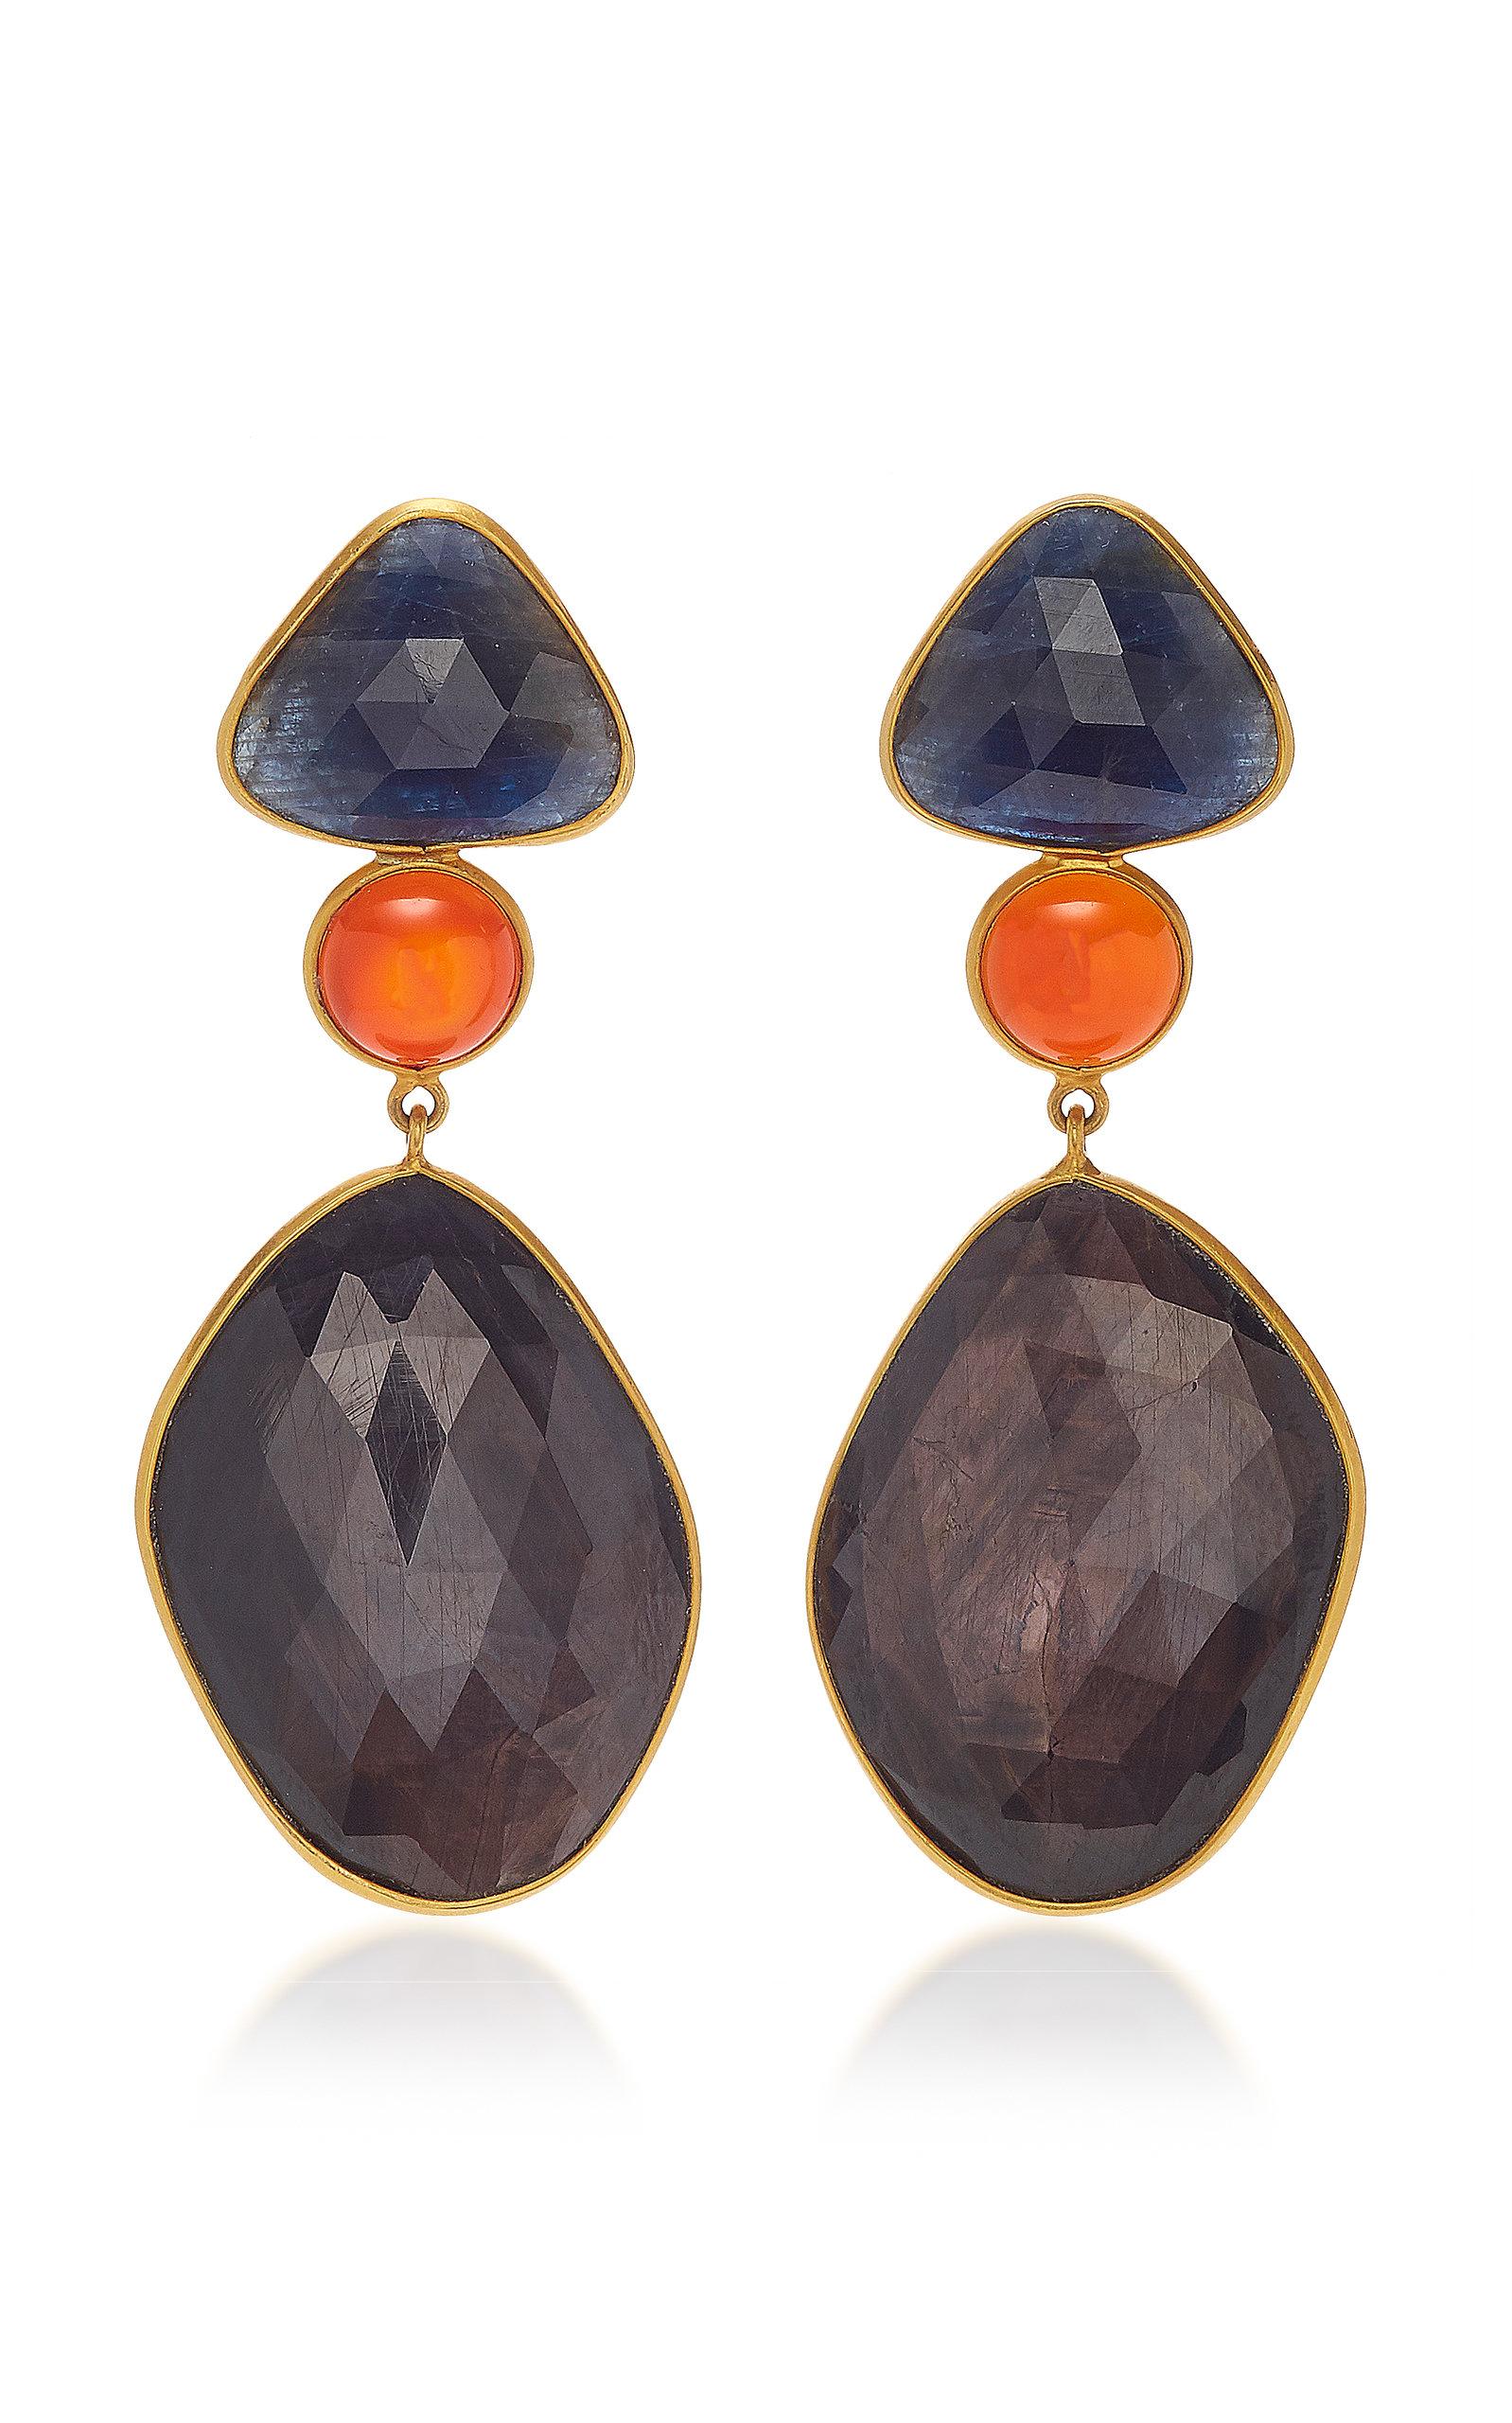 BAHINA 18K Gold Sapphire And Carnelian Earrings in Blue